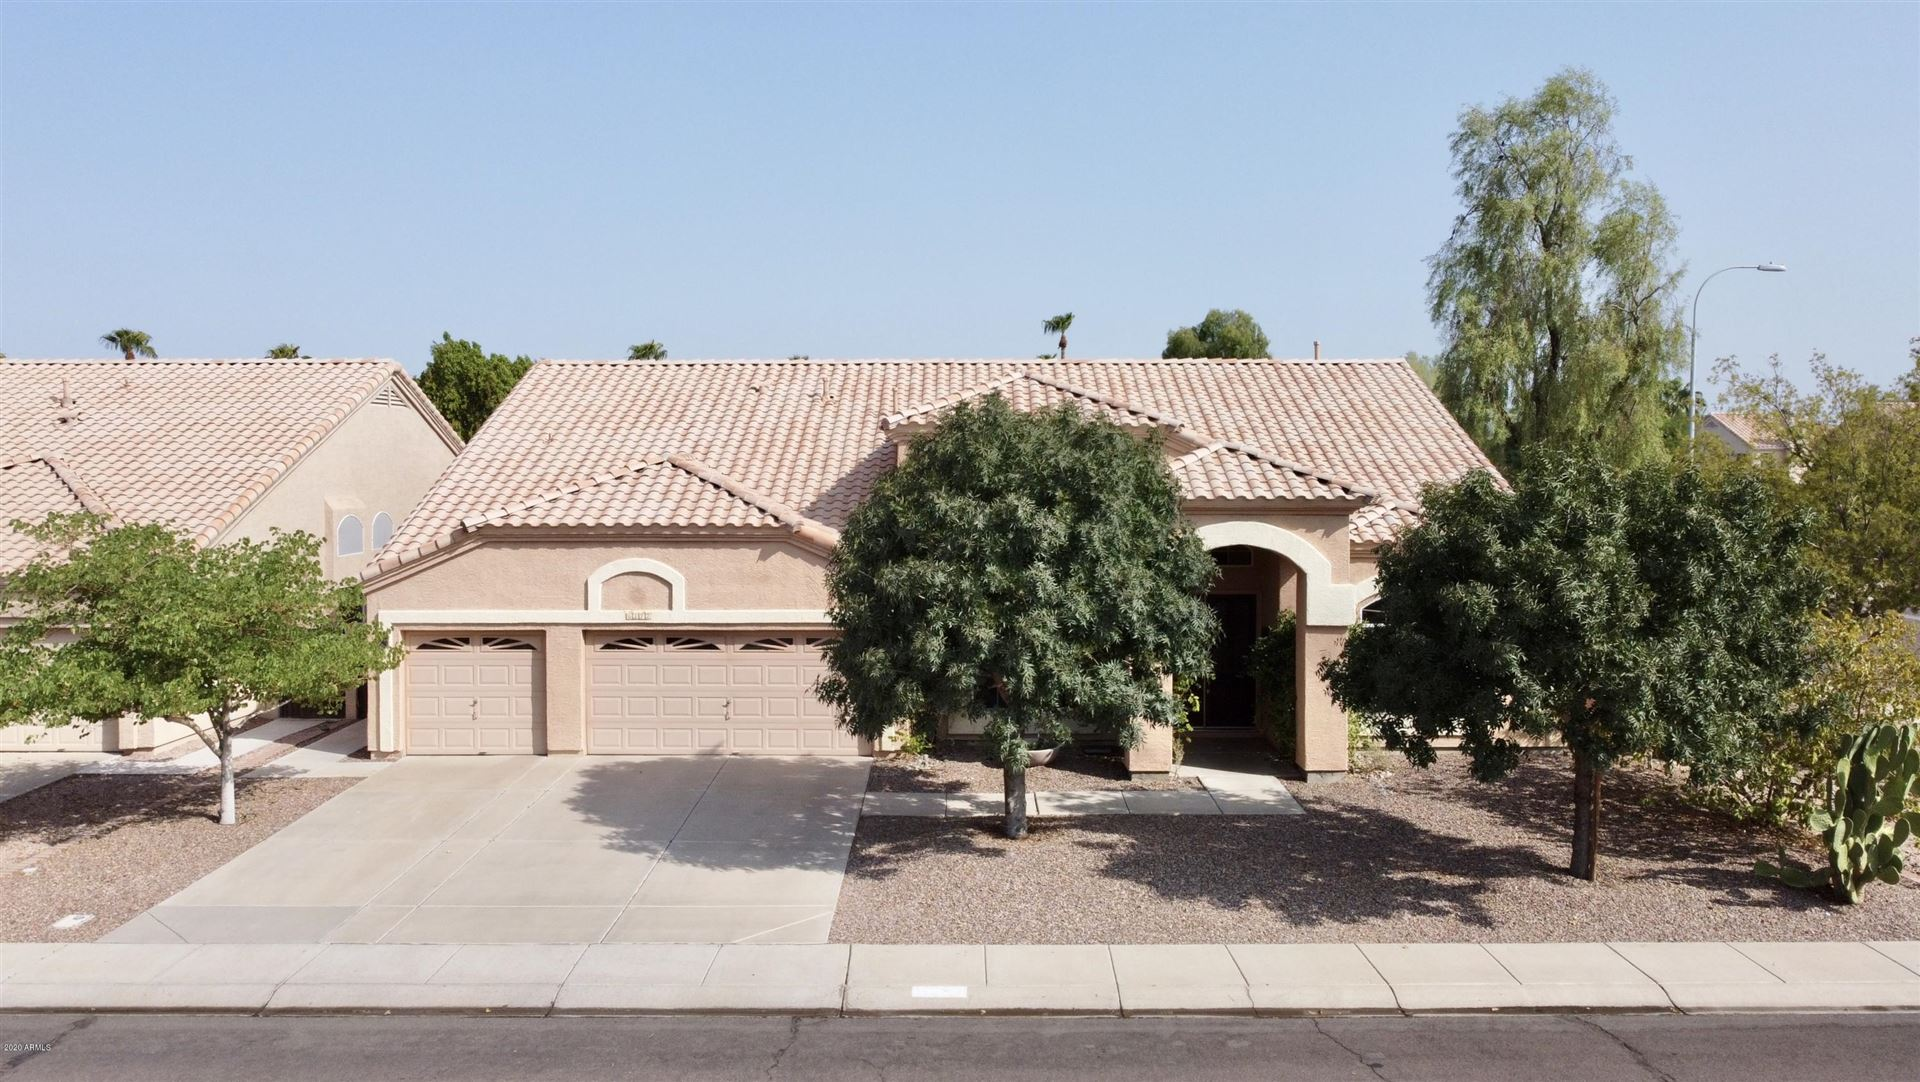 6272 W Shannon Street, Chandler, AZ 85226 - MLS#: 6136821